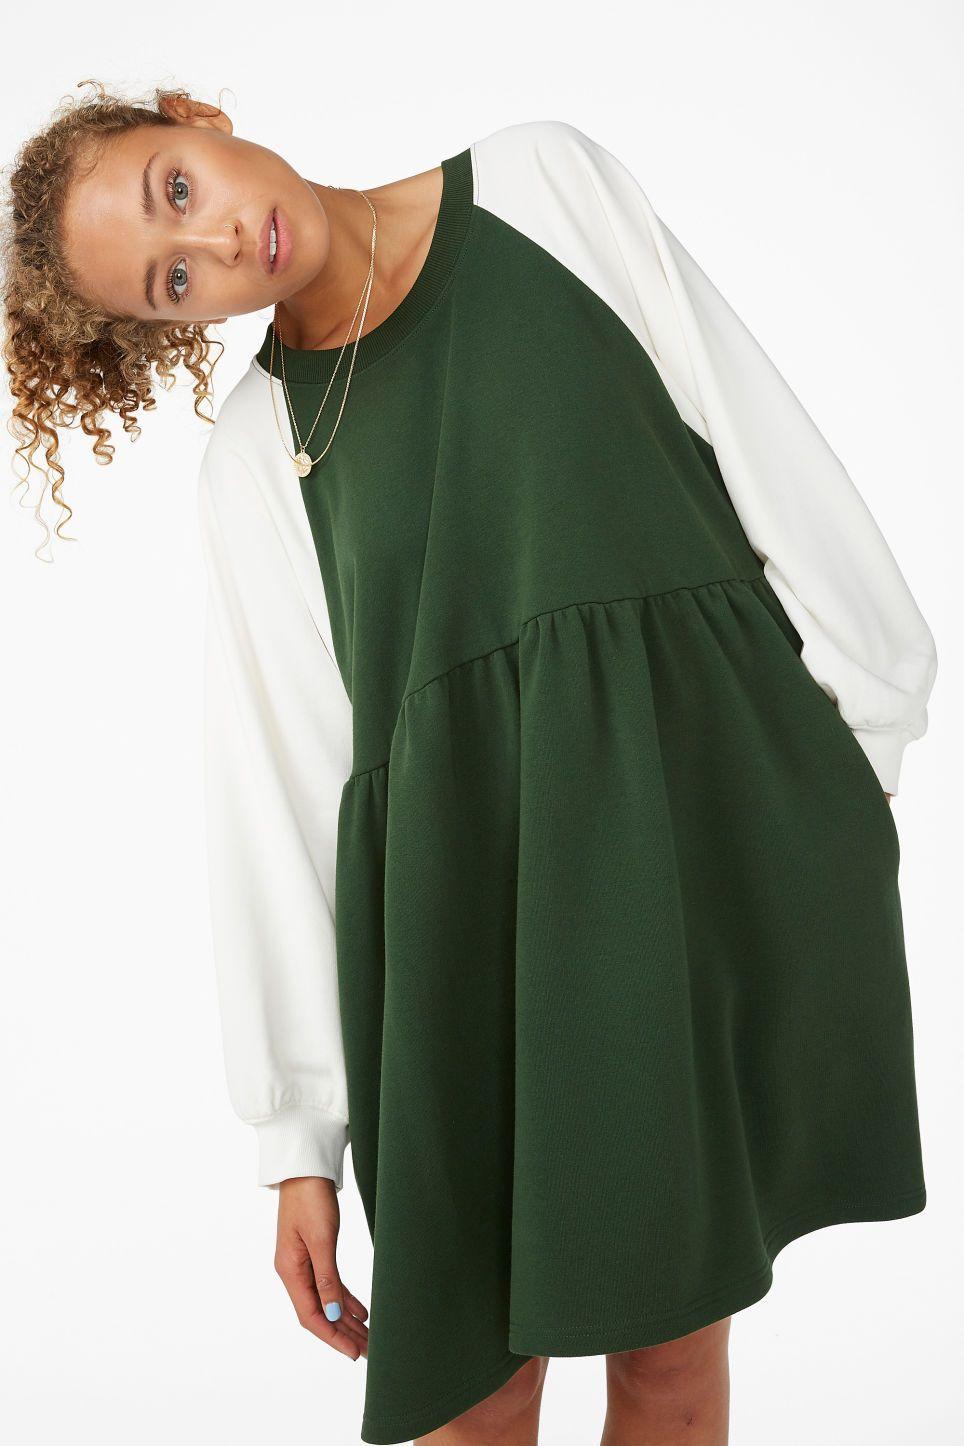 Oversized dress,organic cotton dress,women dress,sweatshirt dress,cotton dress,sporty casual clothing,organic clothing